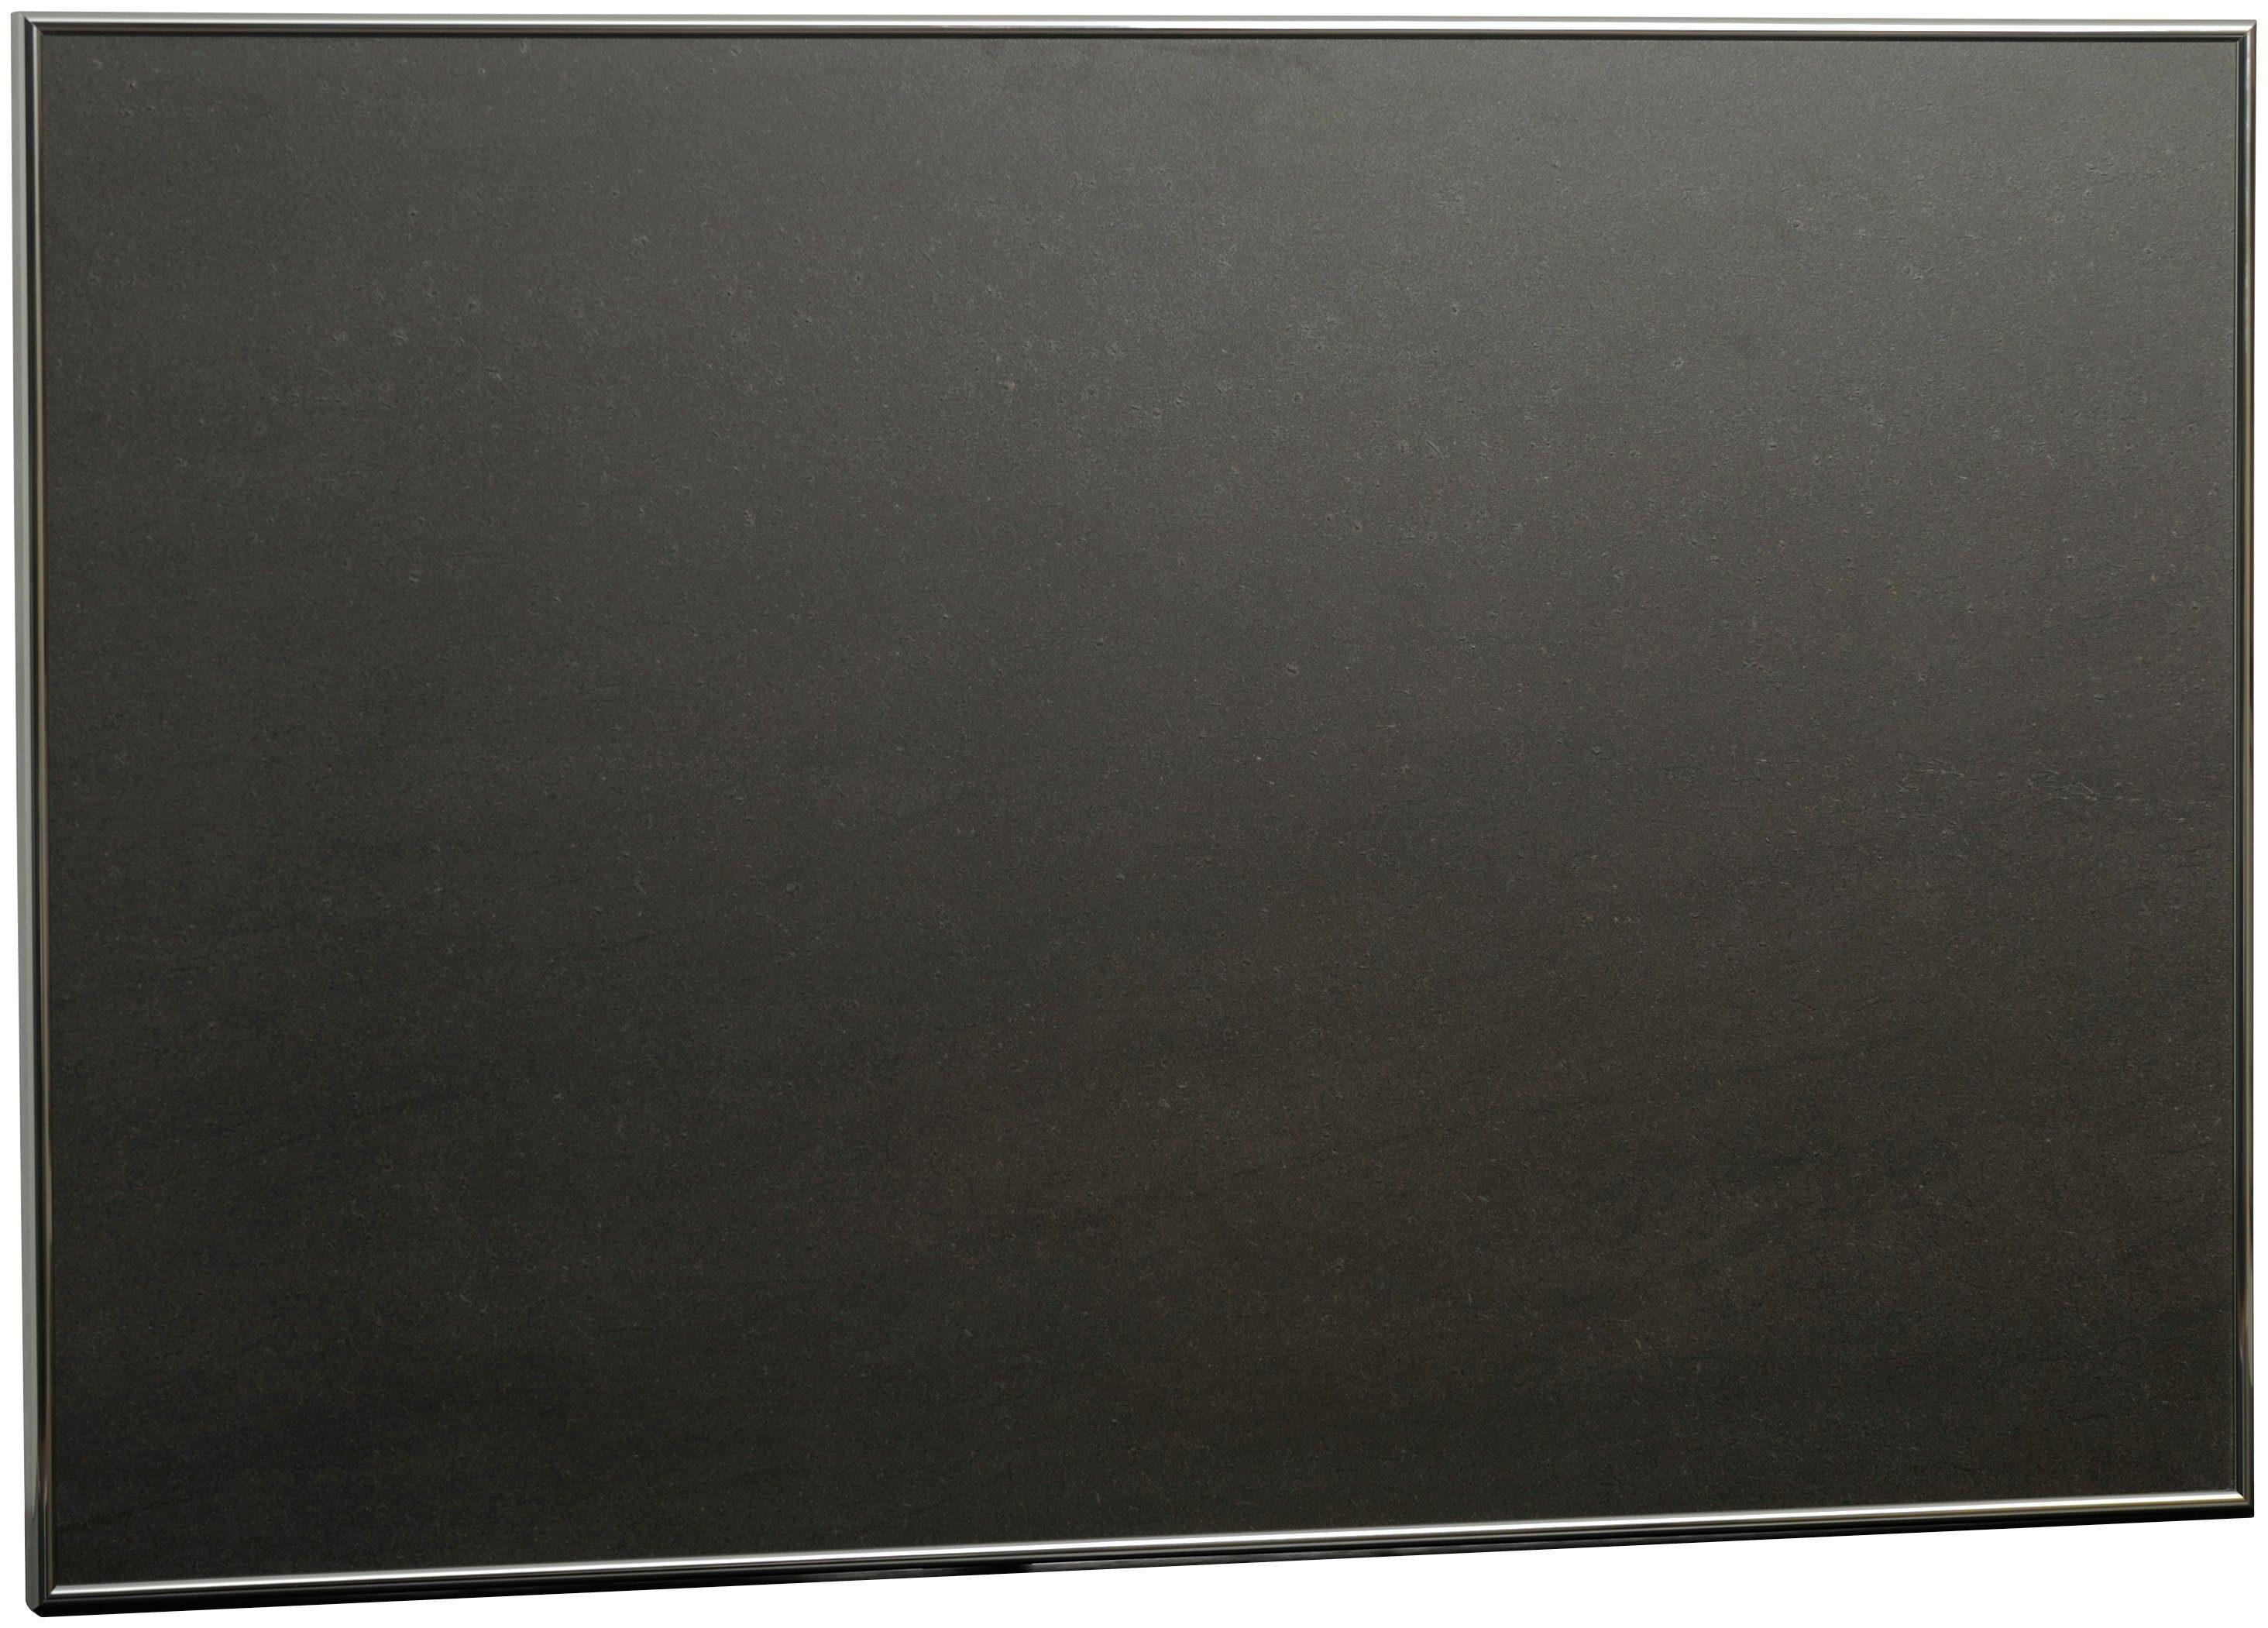 ELBO-THERM Infrarotheizung Tafel, 600 W, BxH: 60x110 cm